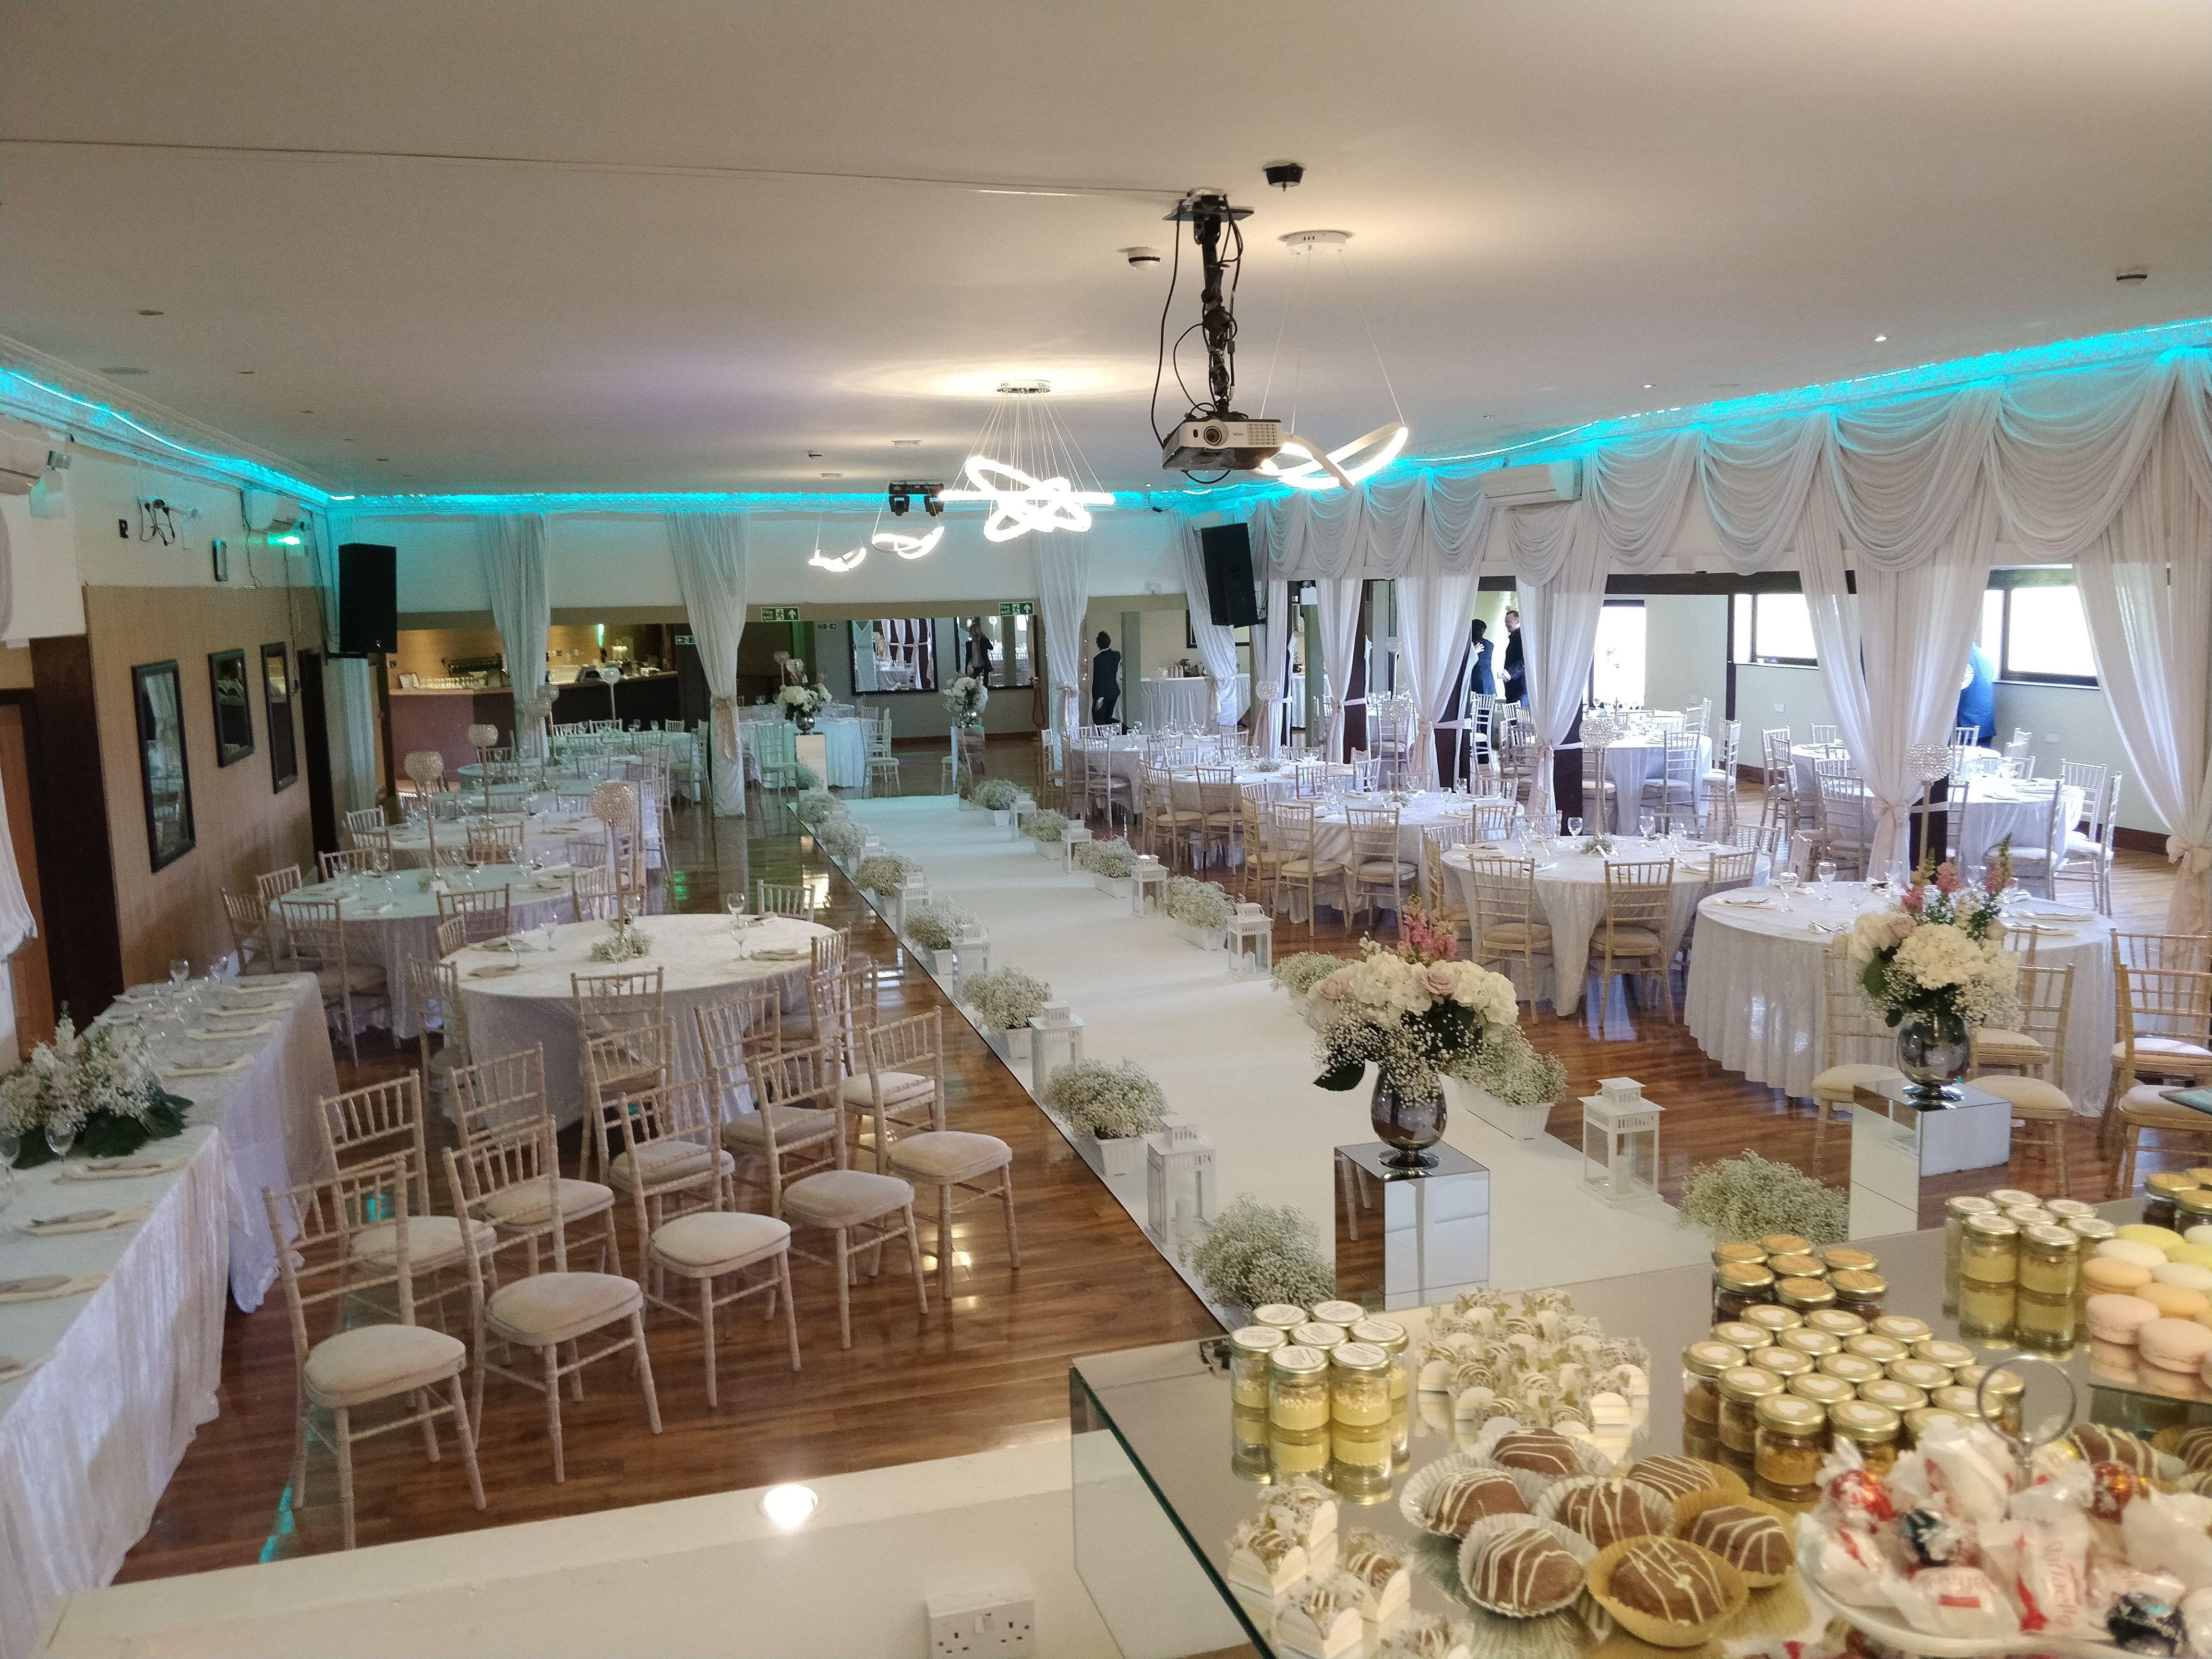 wedding halls near me in 2020 | Wedding venues, Wedding ...